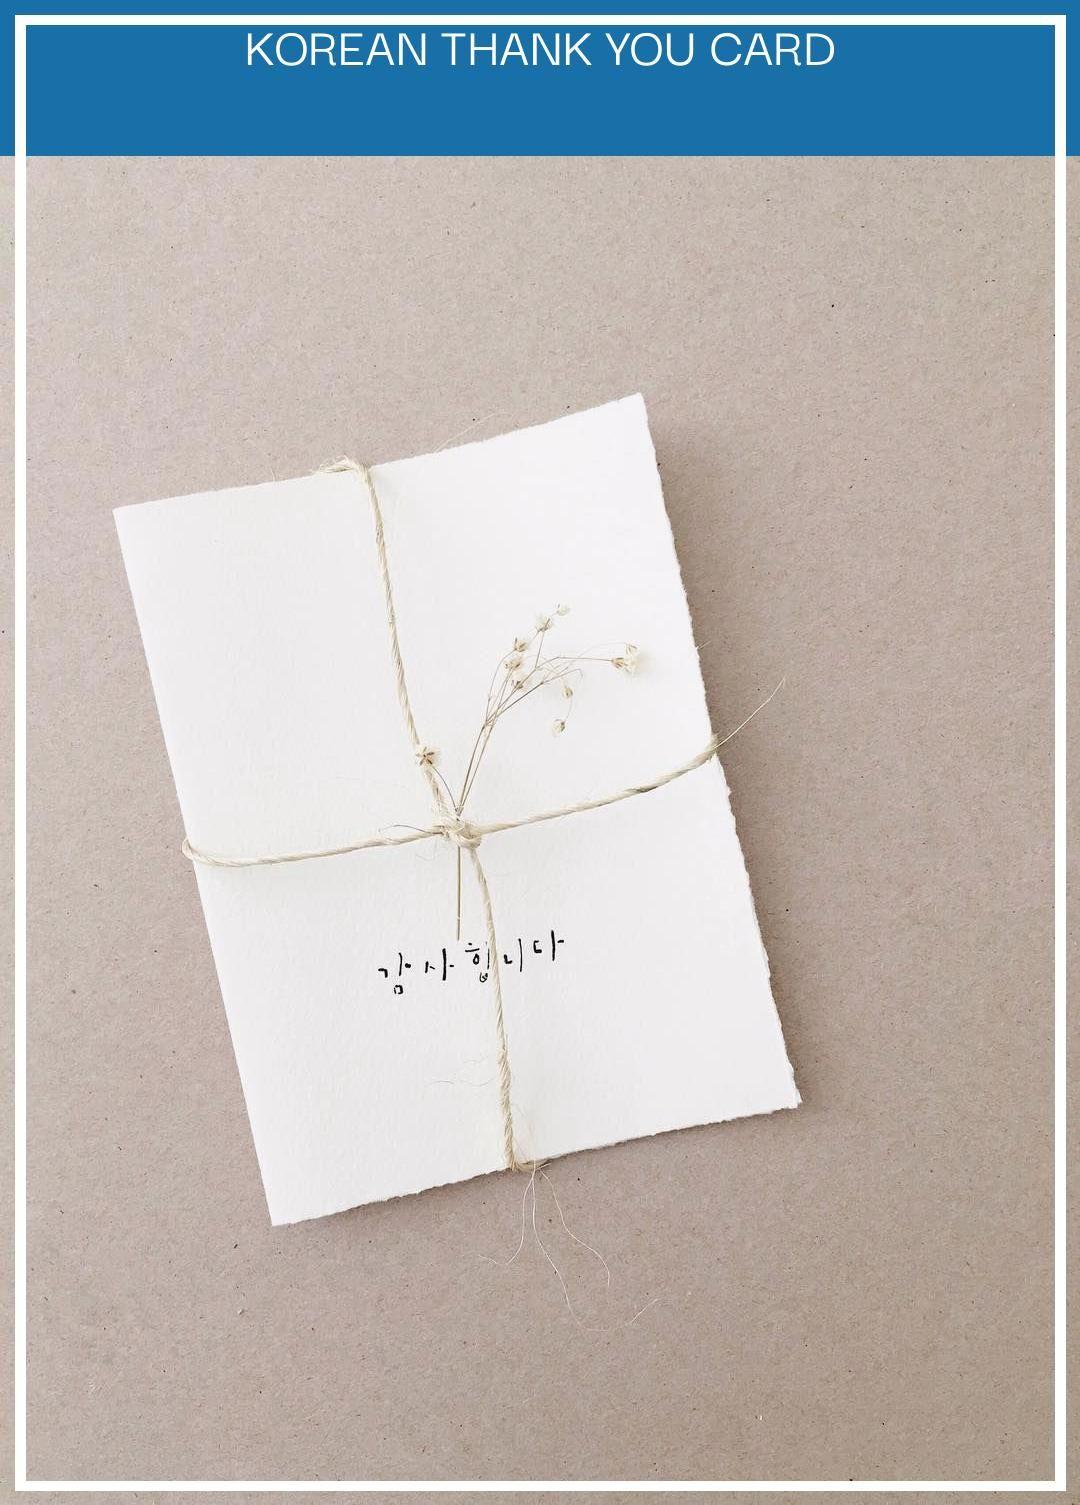 17 Primairet Korean Thank You Card Thank You Cards Funeral Thank You Cards Your Cards